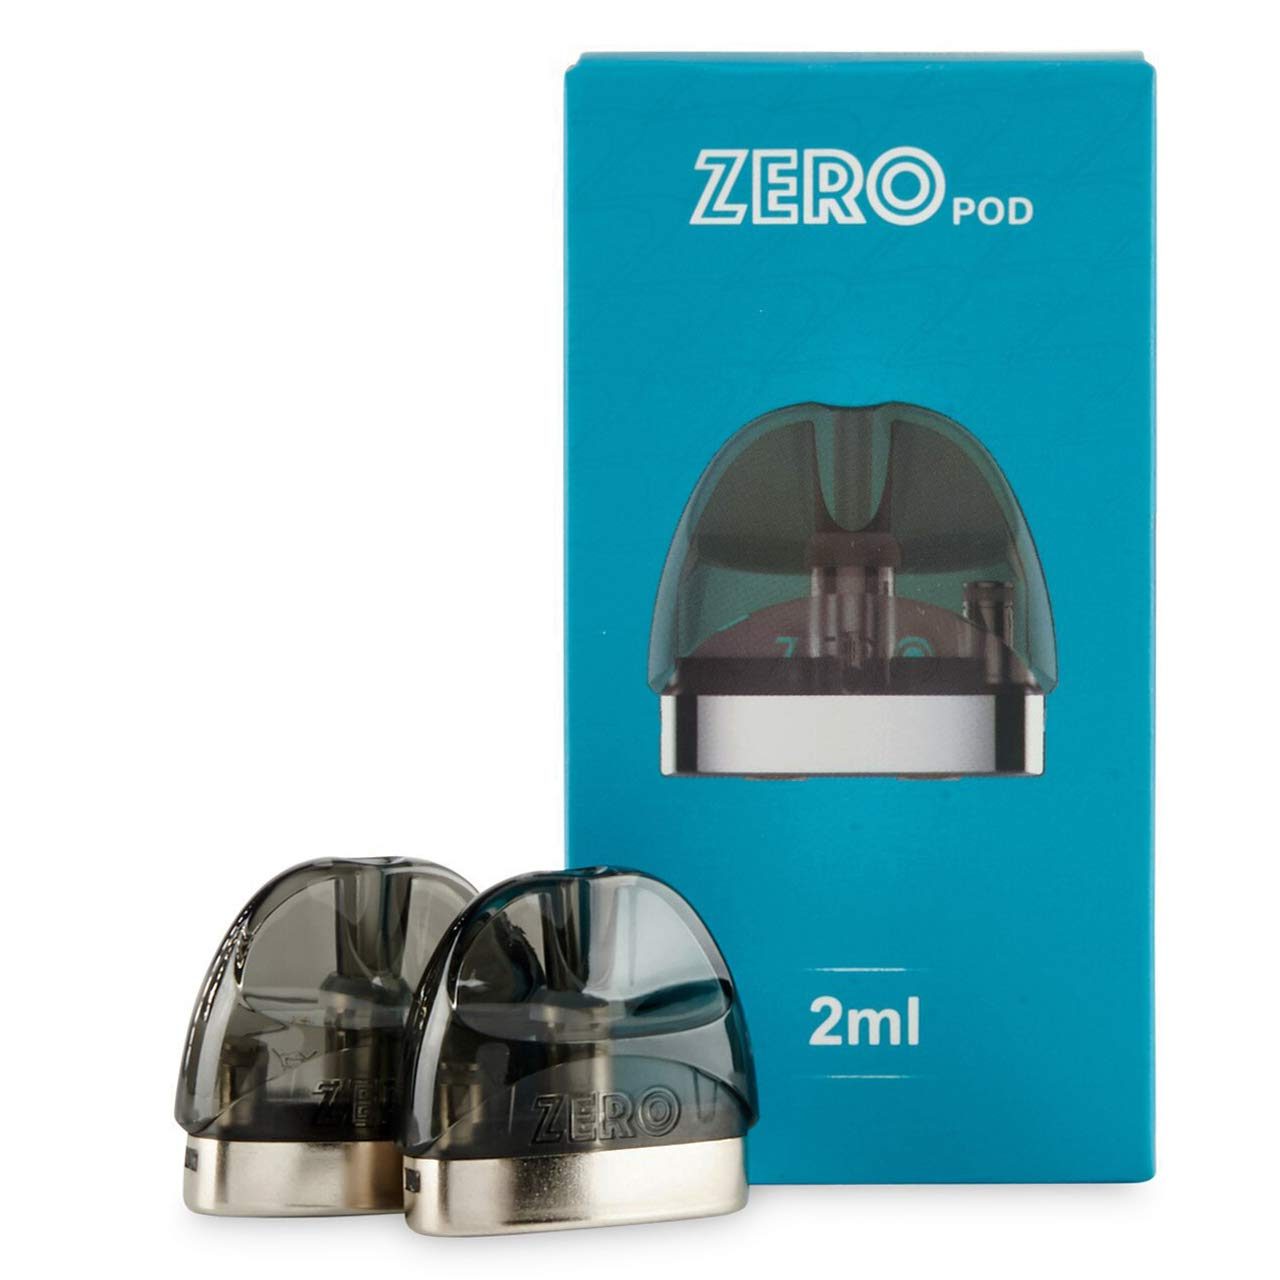 Original Vaporesso Renova Zero Cartridge CCELL Pod (CCELL Pod × 2), 2ml 1.0Ω CCELL Replacement Pod Carteidge for Renova Zero Kit/Zero Kit Care Version, No Nicotine